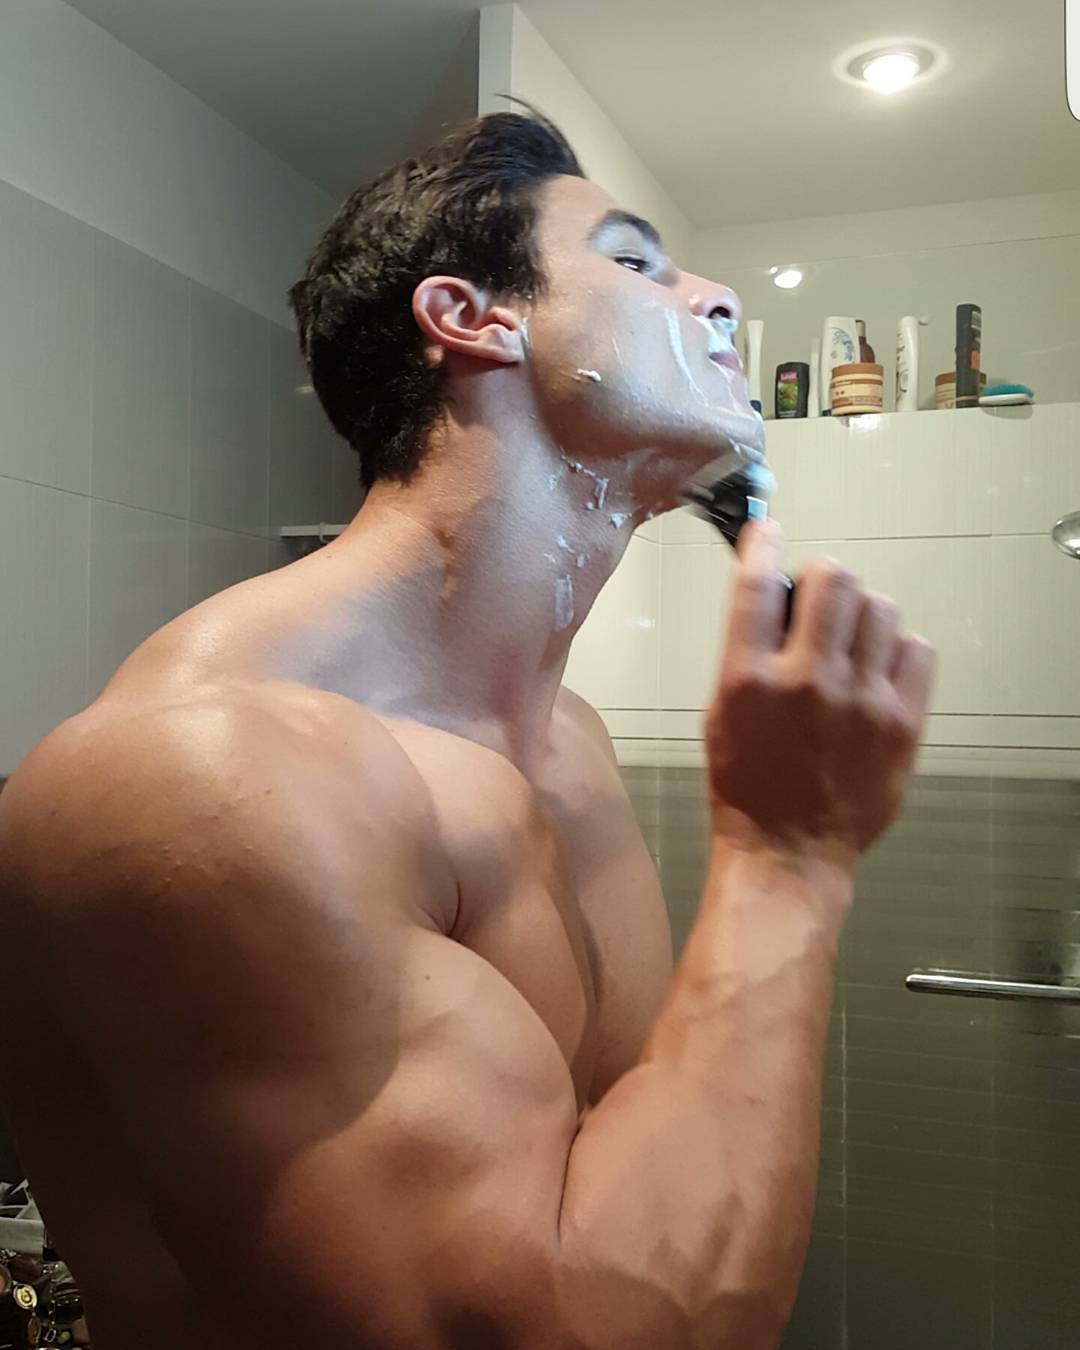 sexy-masculine-alpha-guy-shaving-beard-huge-muscular-body